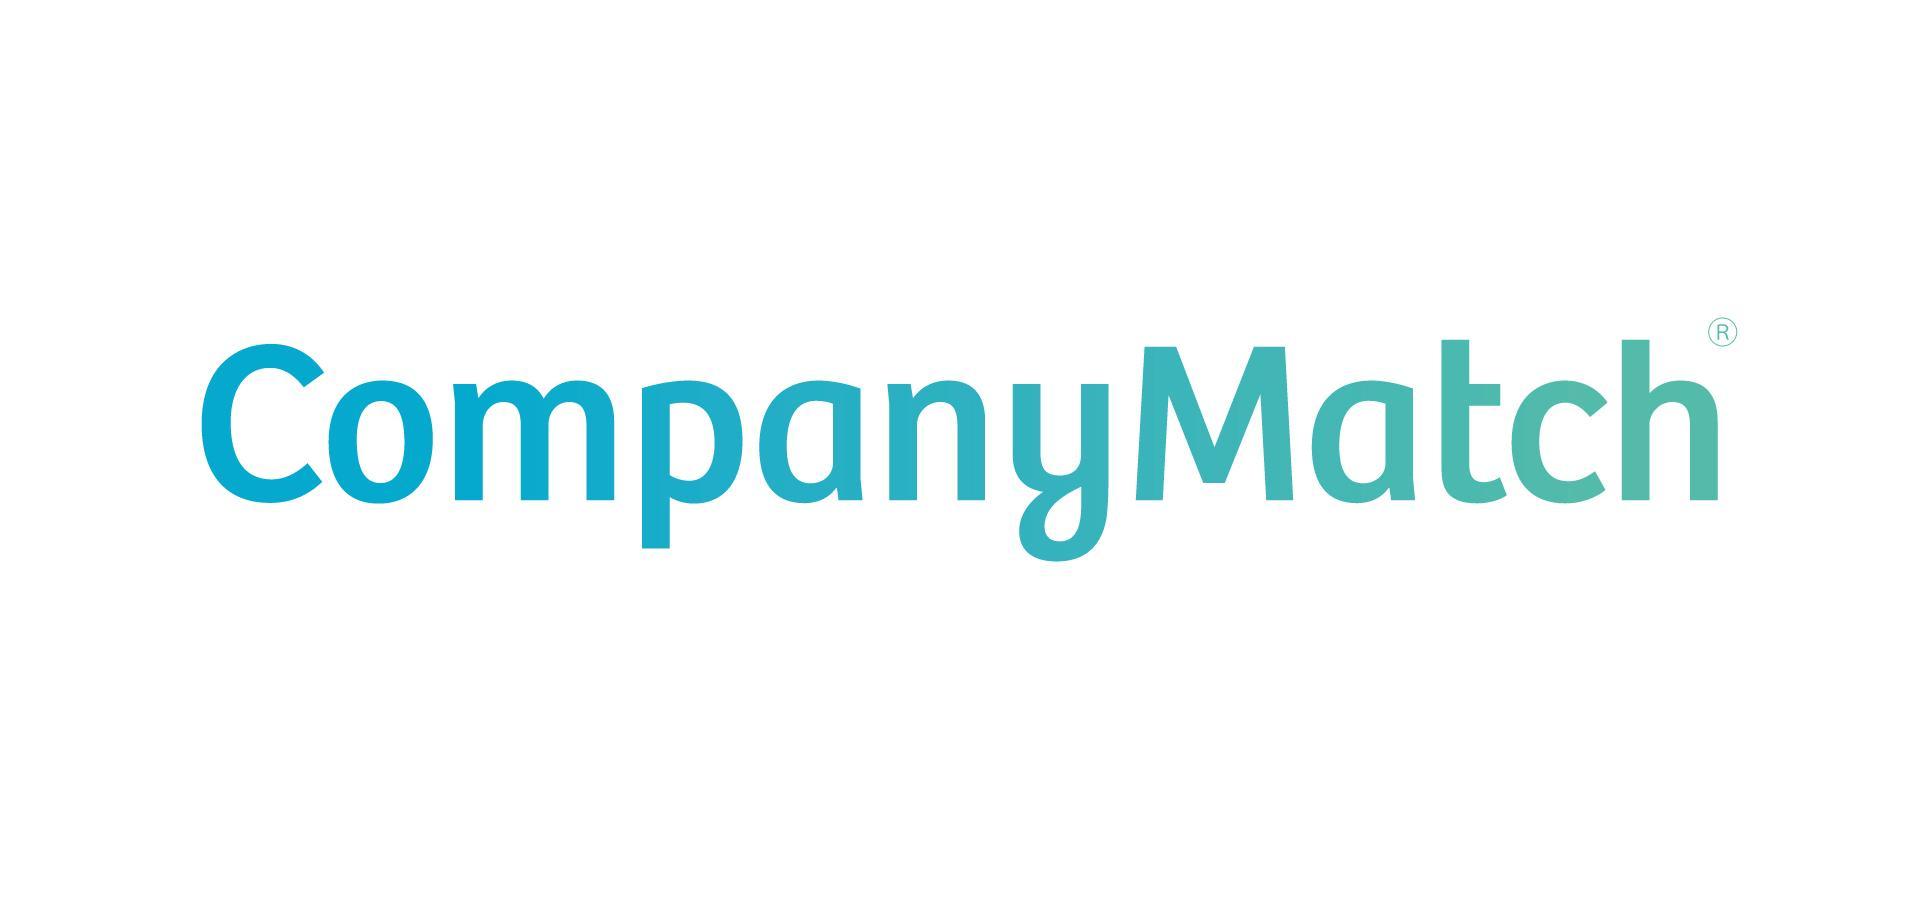 Paul Fonolla Joins CompanyMatch's Advisory Board